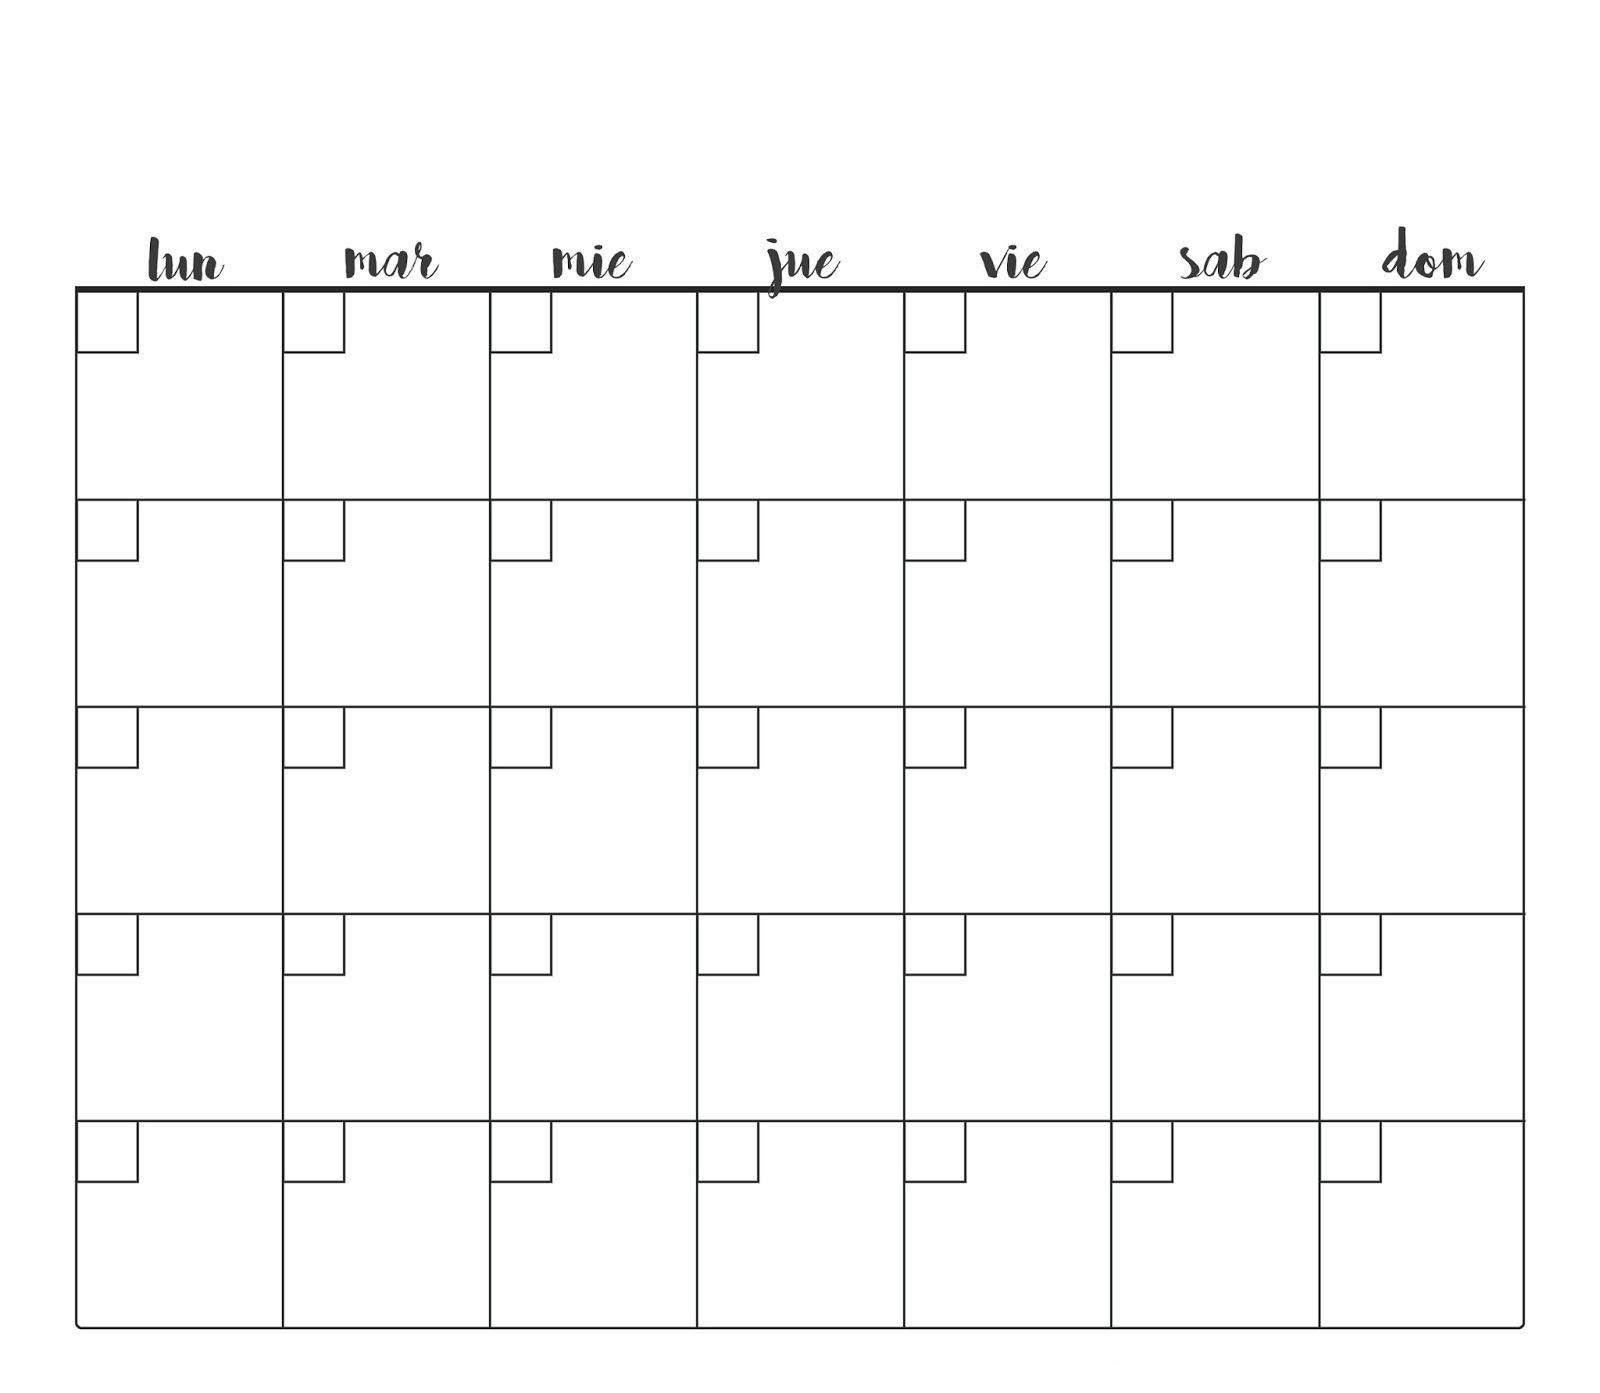 La boheme gamine IMPRIMIBLES PARA TU BULLET JOURNAL Calendario infinito